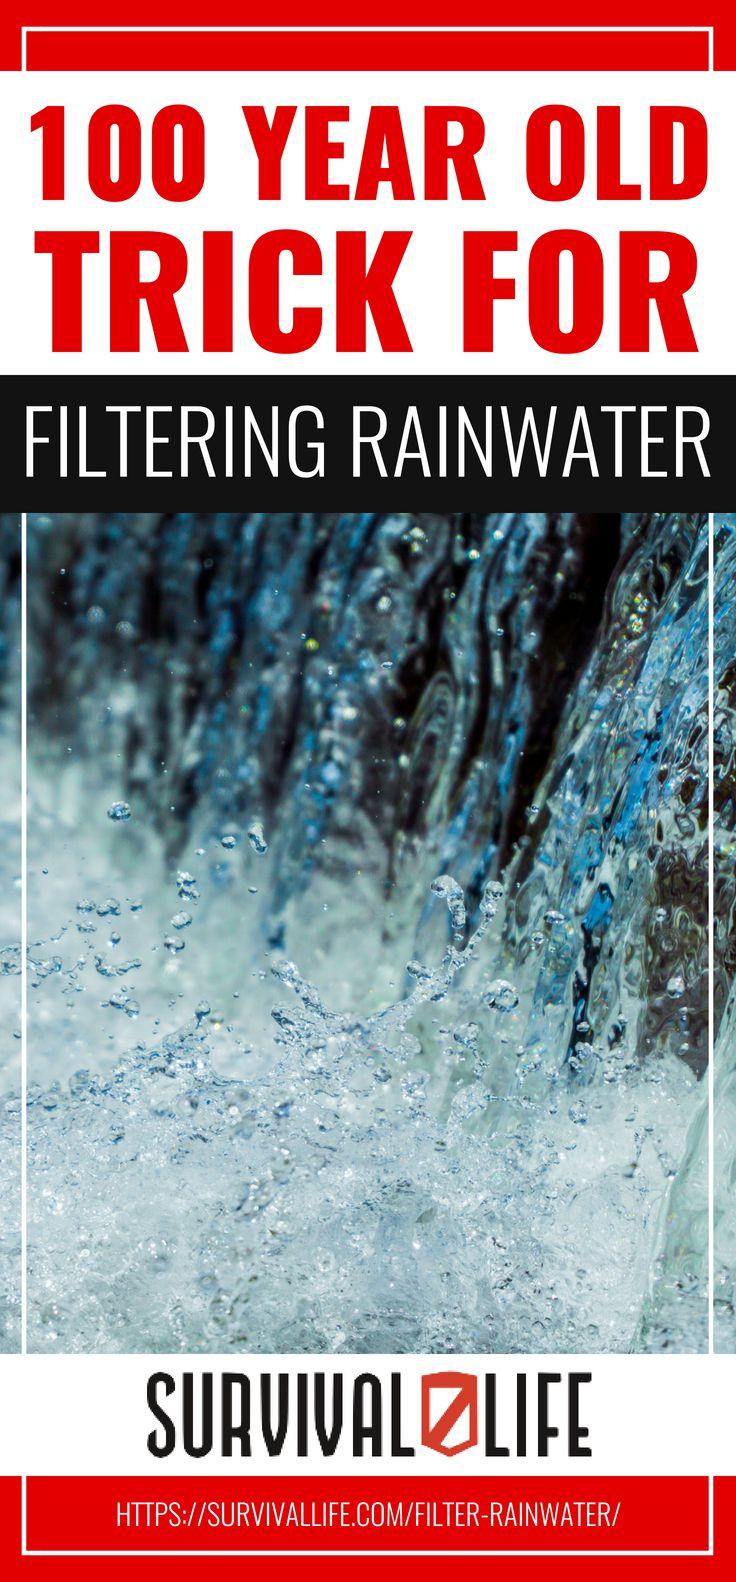 Year-Old Trick For Filtering Rainwater   https://survivallife.com/filter-rainwater/